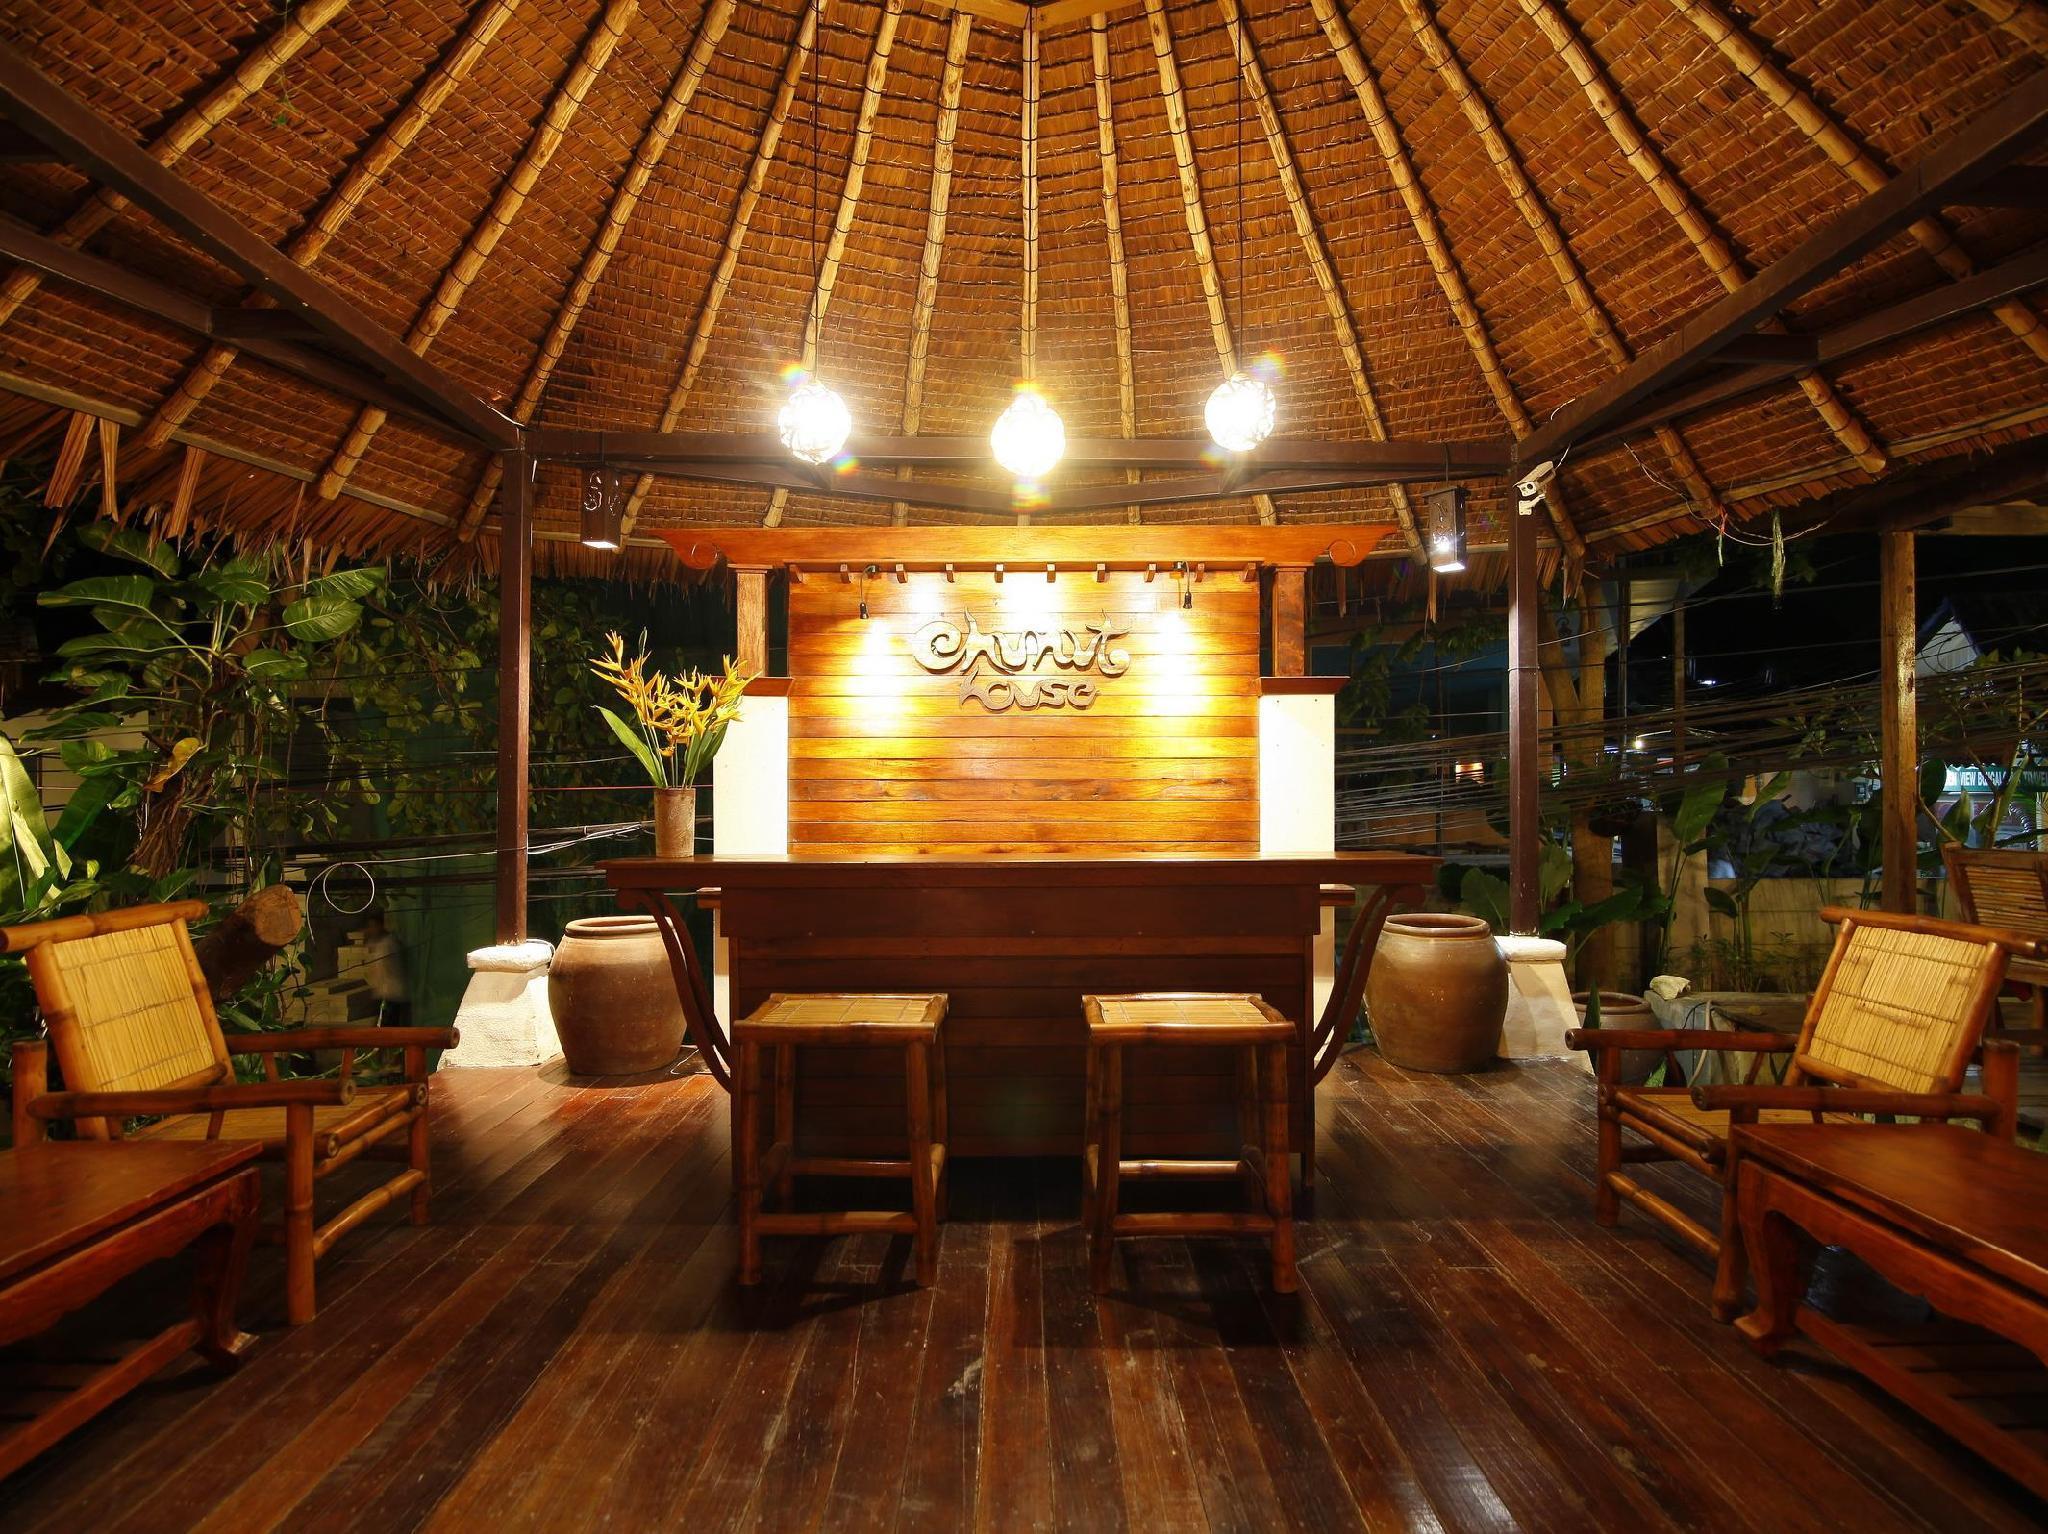 Chunut House Resort ชูนัท เฮาส์ รีสอร์ต